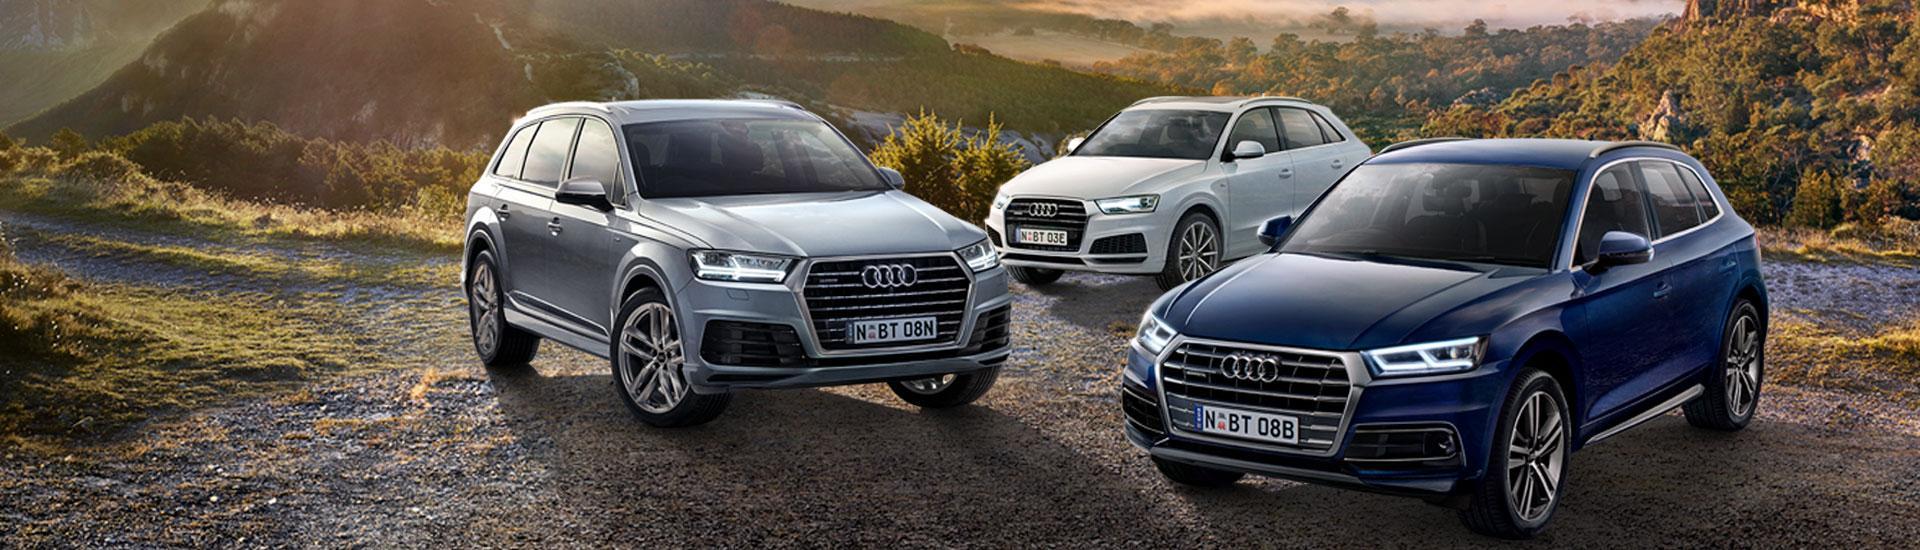 New Audi Cars For Sale In Australia Carsalescomau - Cheapest audi car